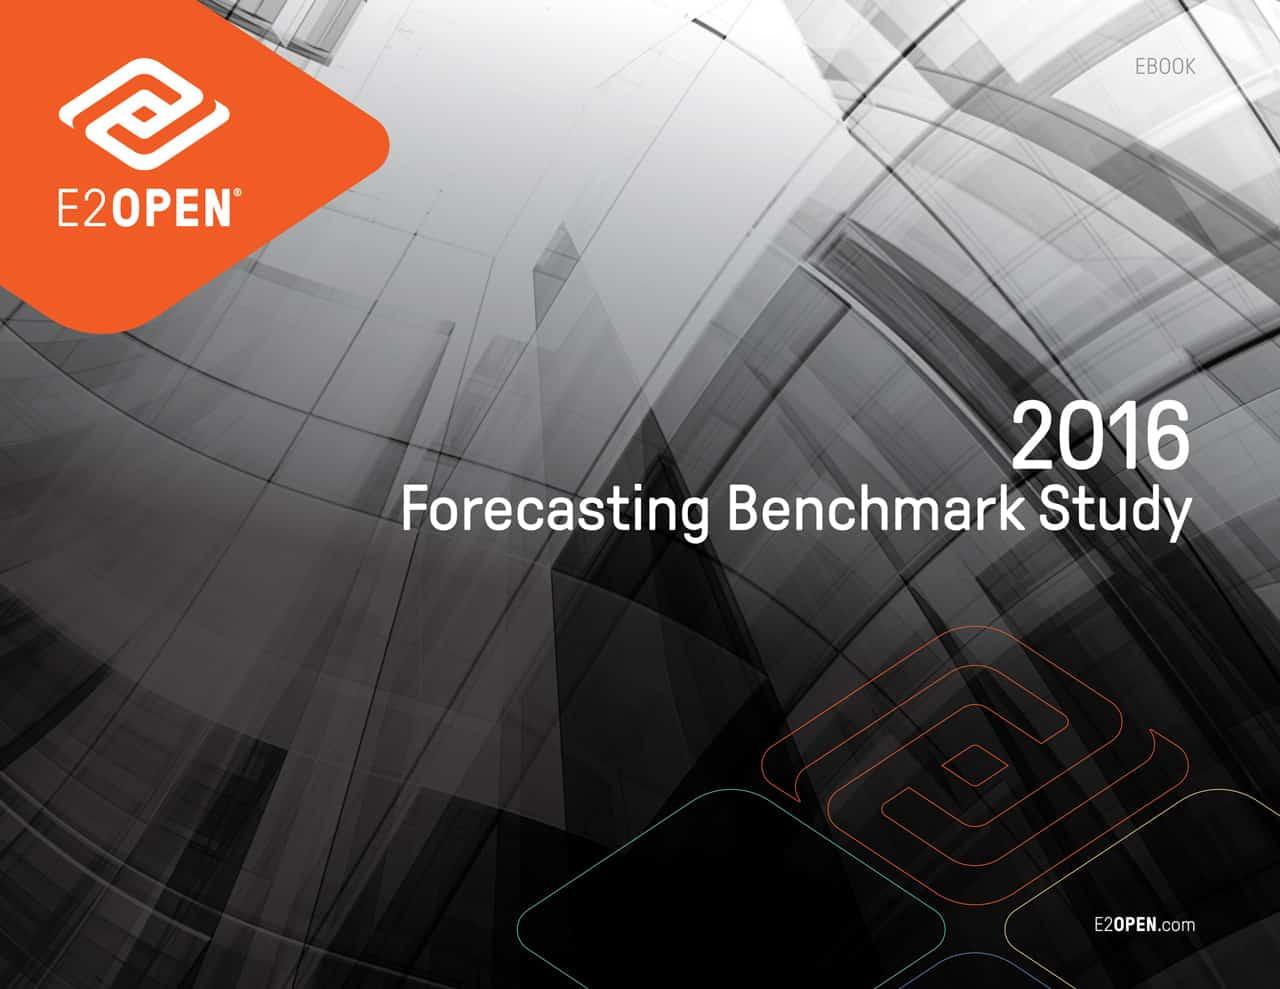 eBook: 2016 Forecasting Benchmark Study